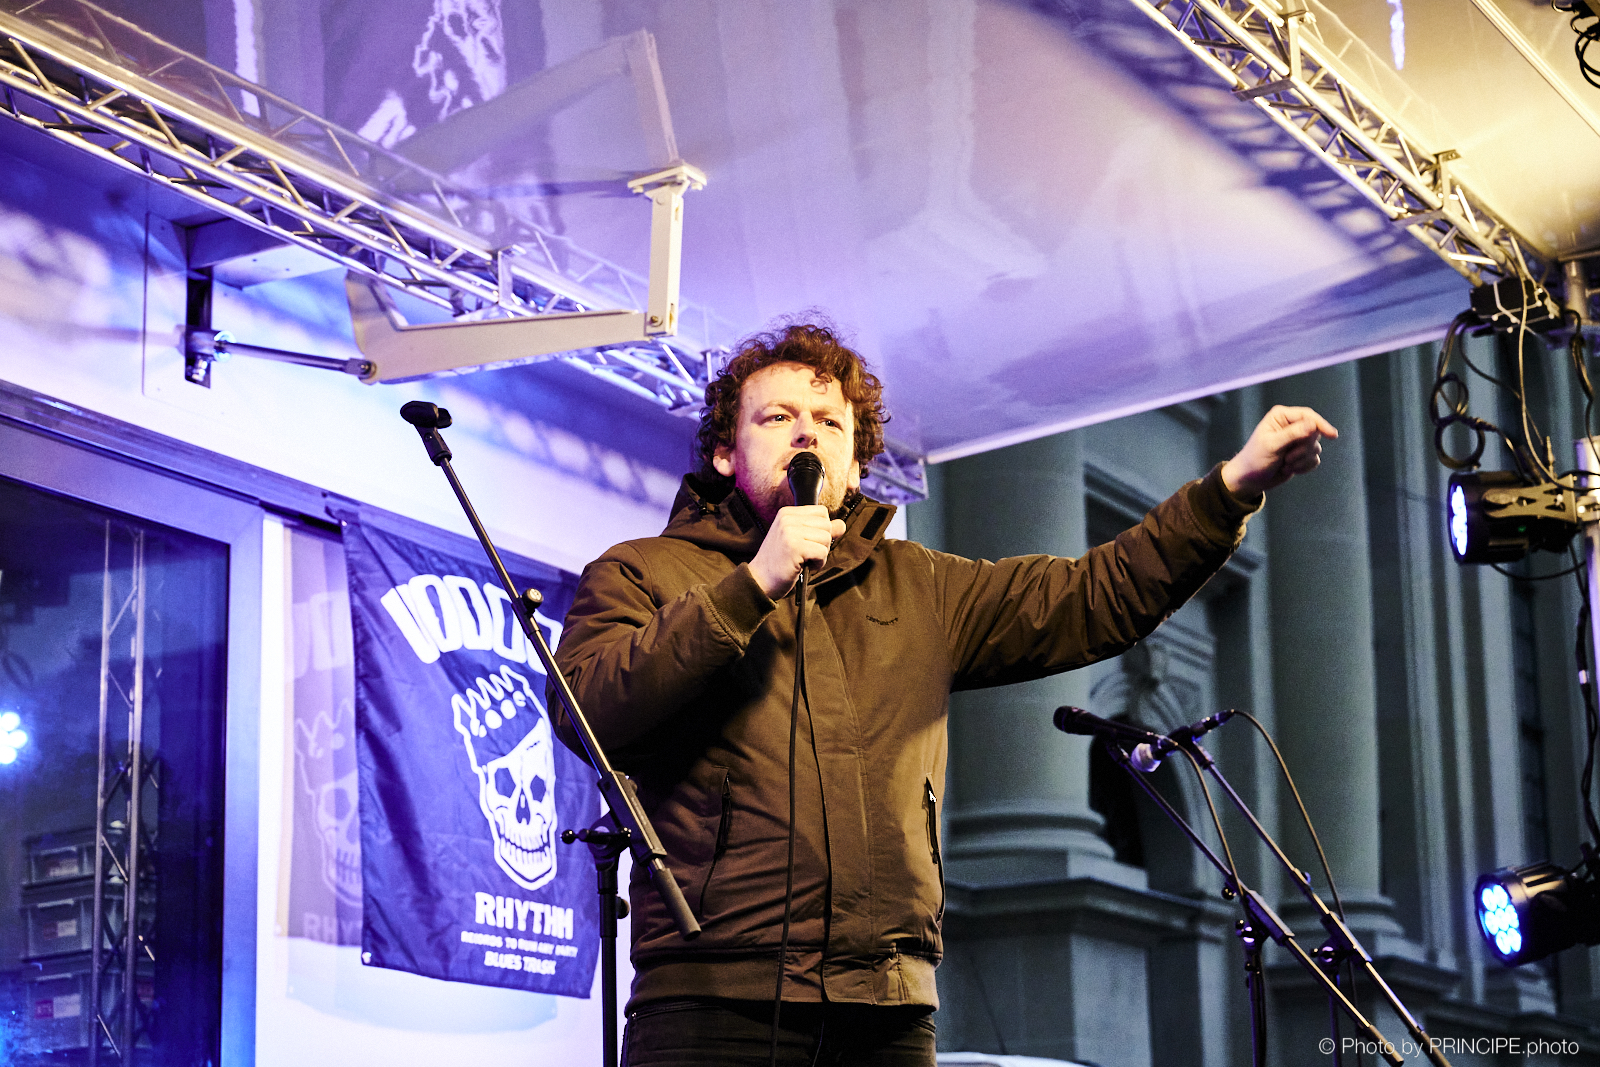 Johannes Dullin @ Voodoo Rhythm Records Live Radio Show